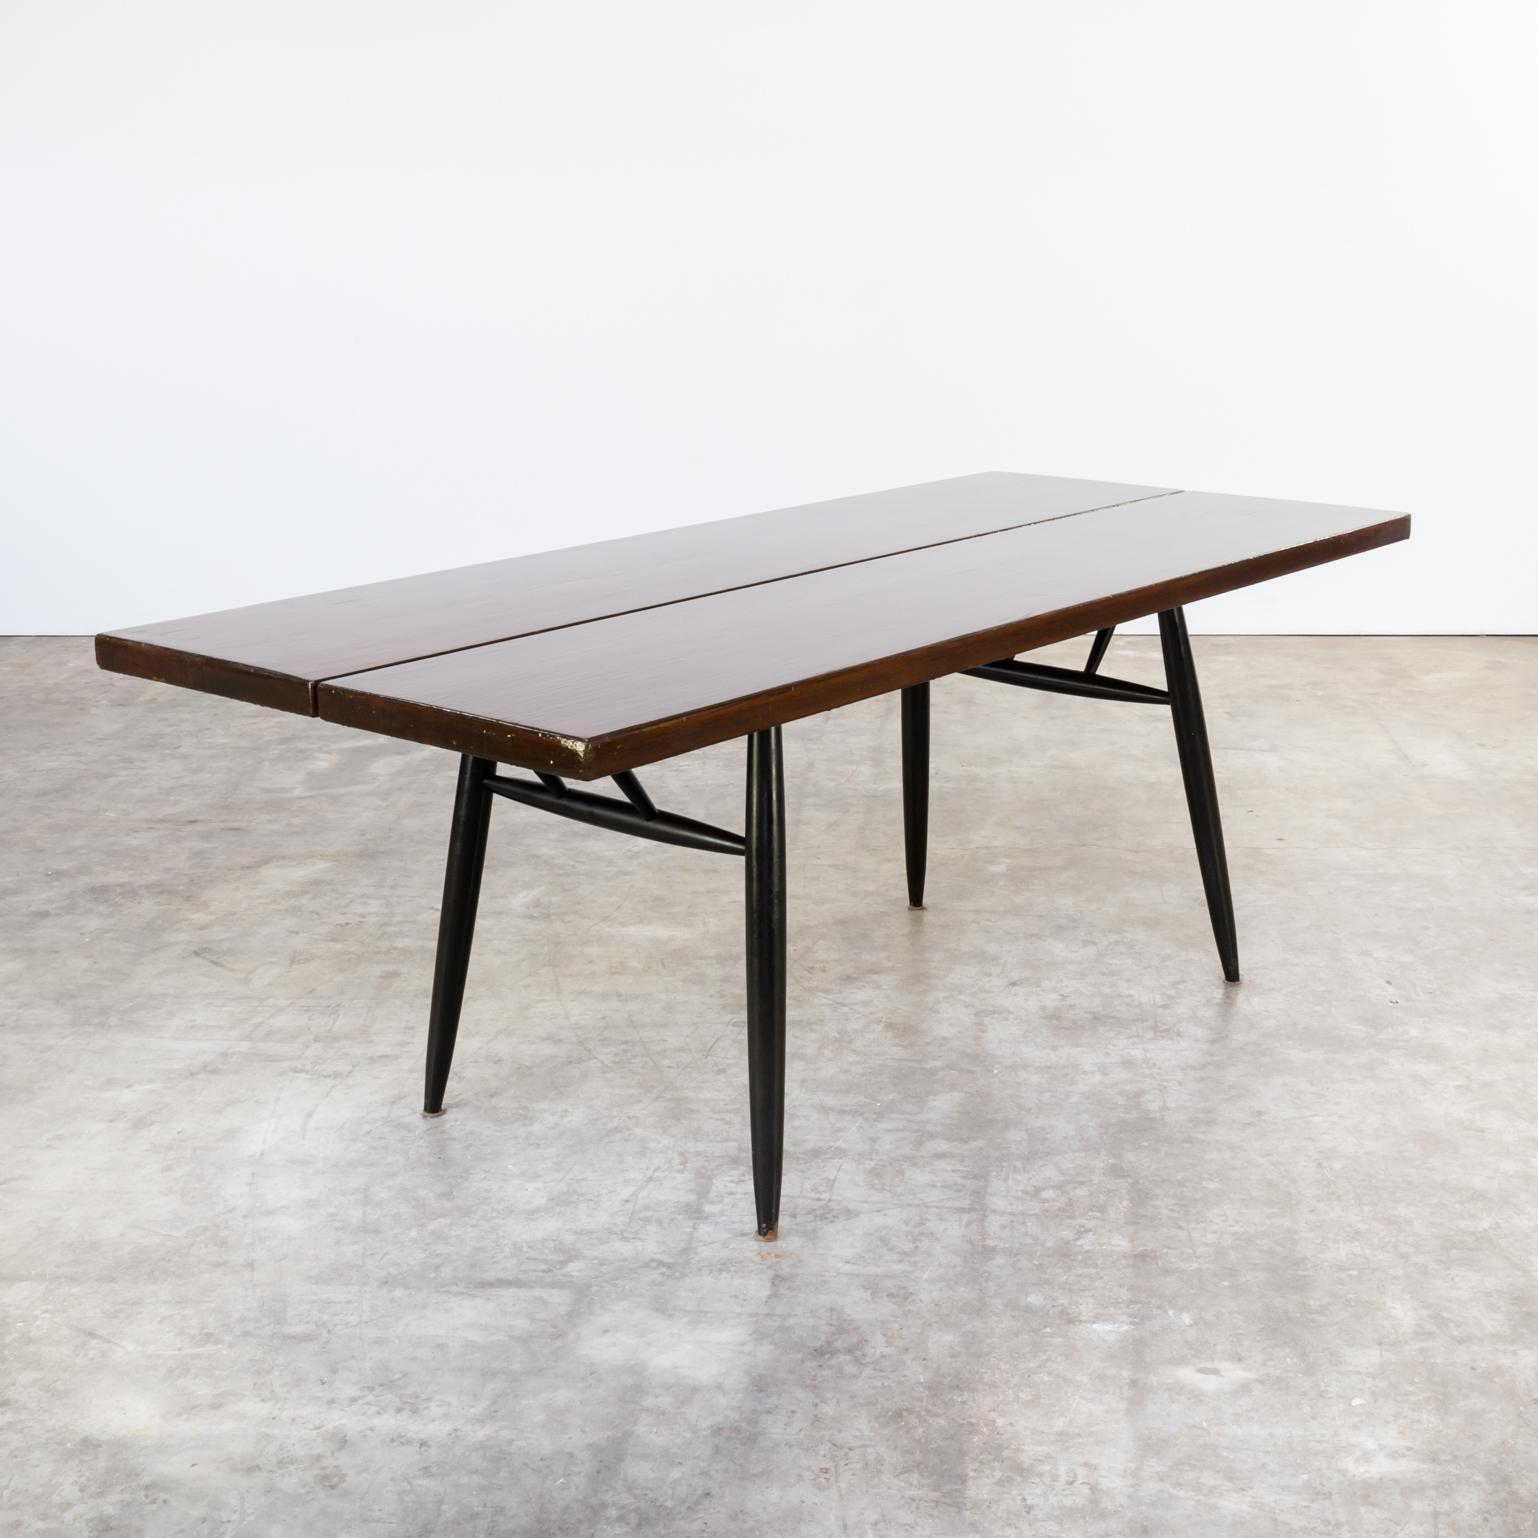 60s ilmari tapiovaara pirkka dining table for laukaan puu barbmama